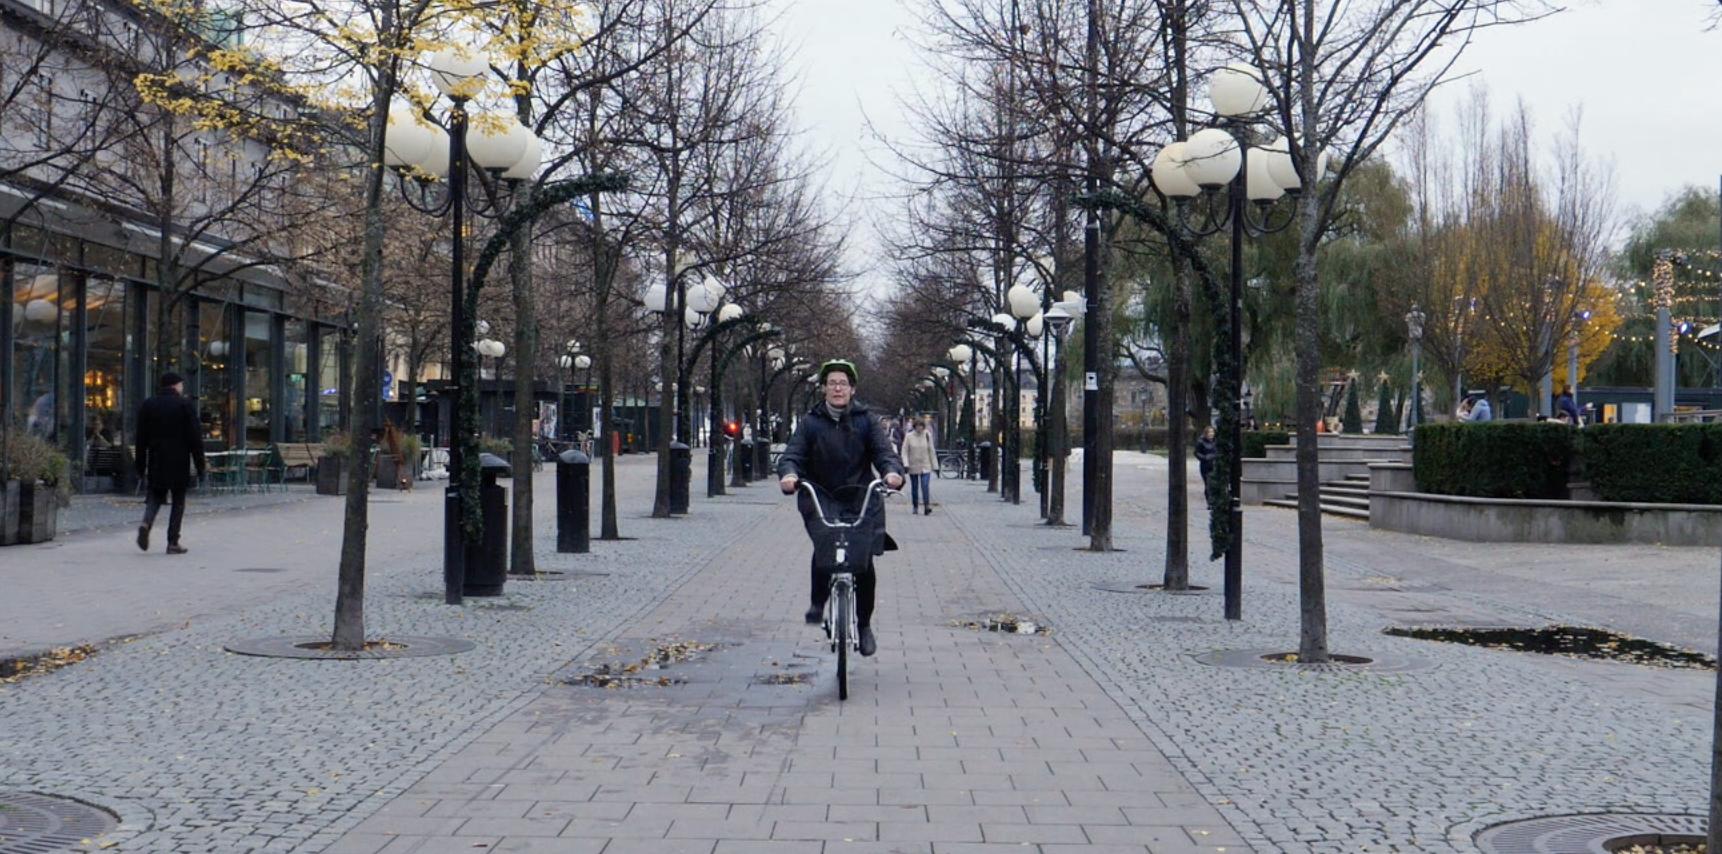 Embaixadora finlandesa na Suécia, Liisa Talonpoika, abandonou o carro oficial e vai todos os dias para o trabalho de bicicleta.